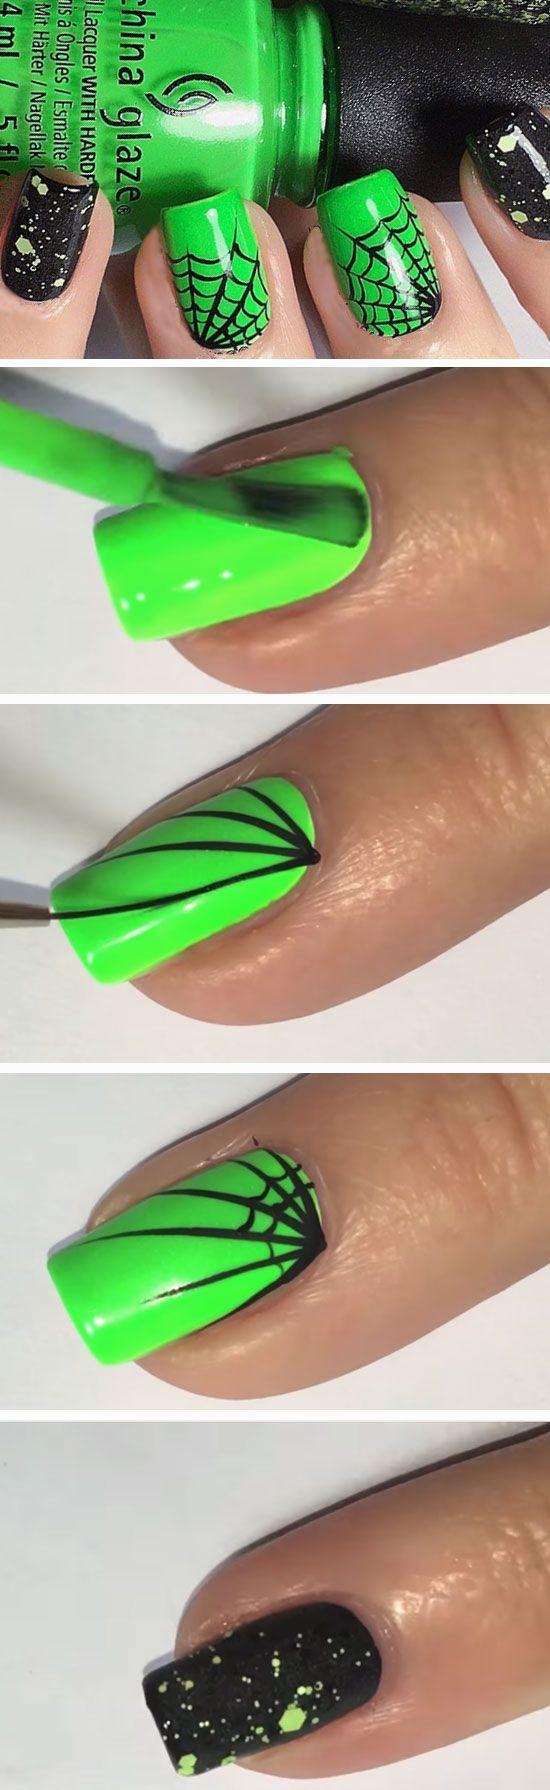 23 Easy Halloween Nail Art Ideas for Teens | Uñas de gato, Arte uñas ...